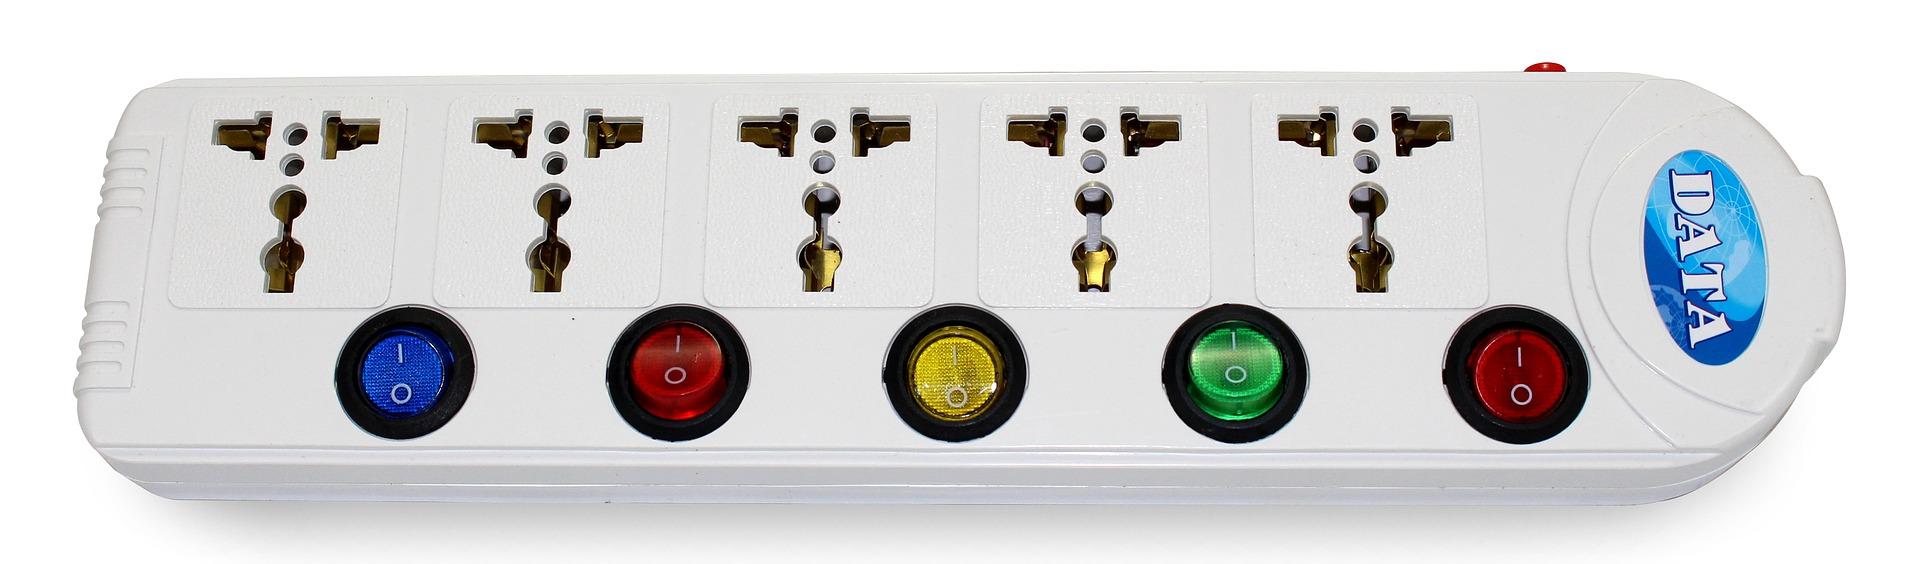 power plug 2802657 1920 - 【レビュー】世界対応マルチ変換プラグNIERBO TP40と一緒なら行けない国はない!?